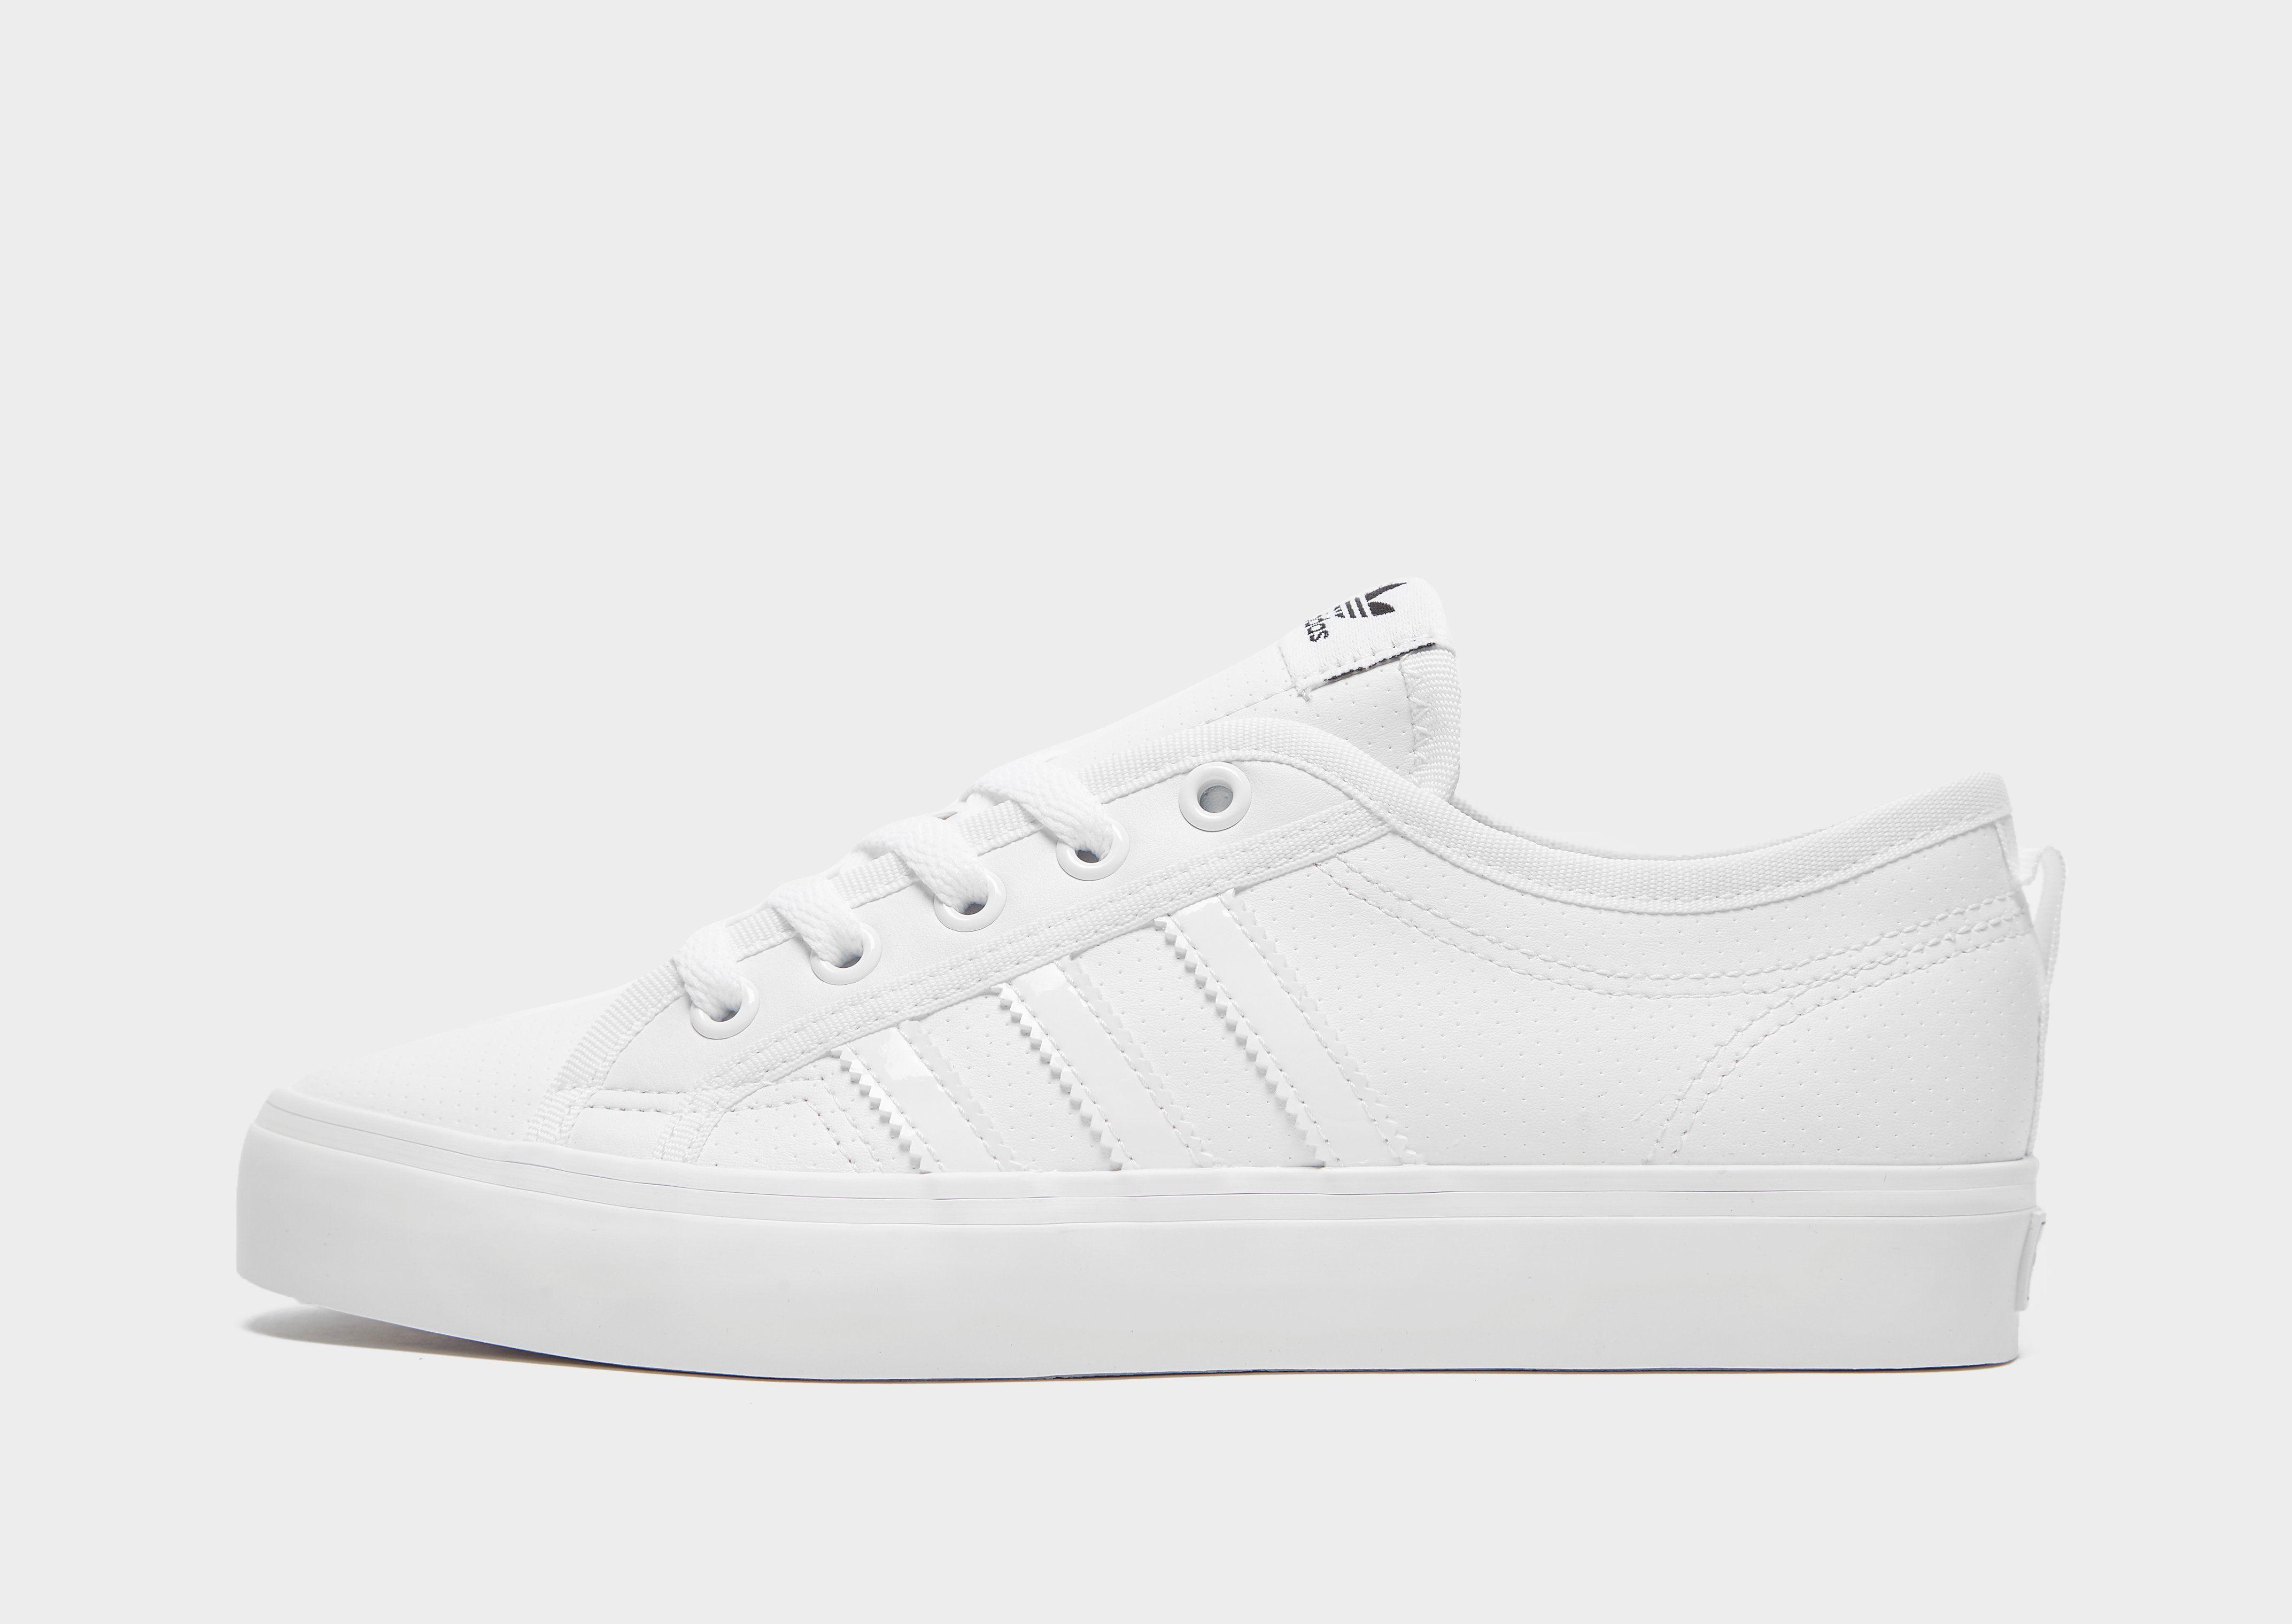 Adidas Lo JuniorJd Sports Originals Nizza 4jR5AL